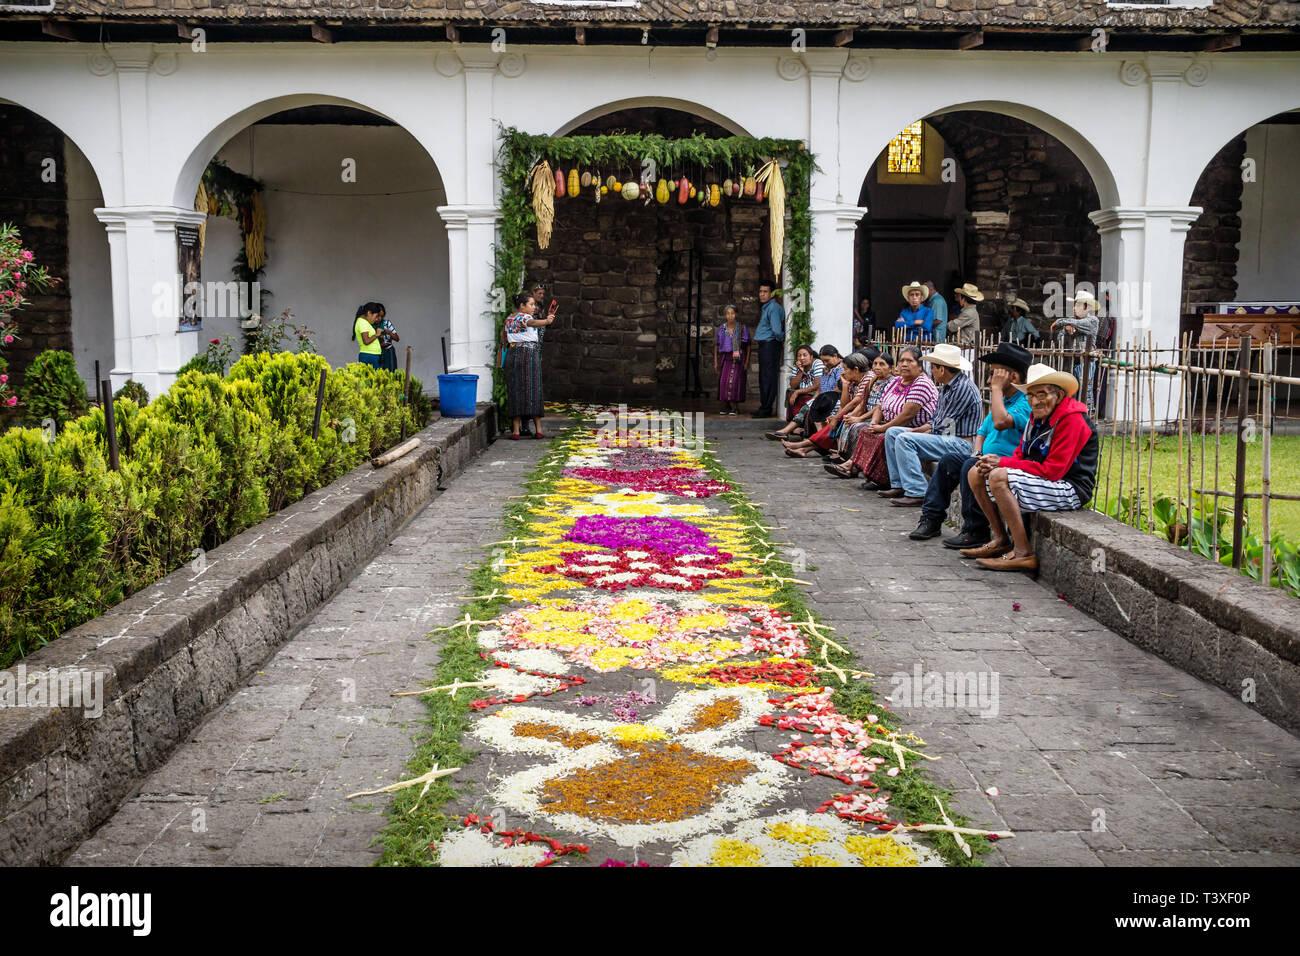 Santiago Atitlan, Guatemala - 29 March 2018: Alfombre, flower carpet for Semana Santa in church backyard and local people sitting along - Stock Image